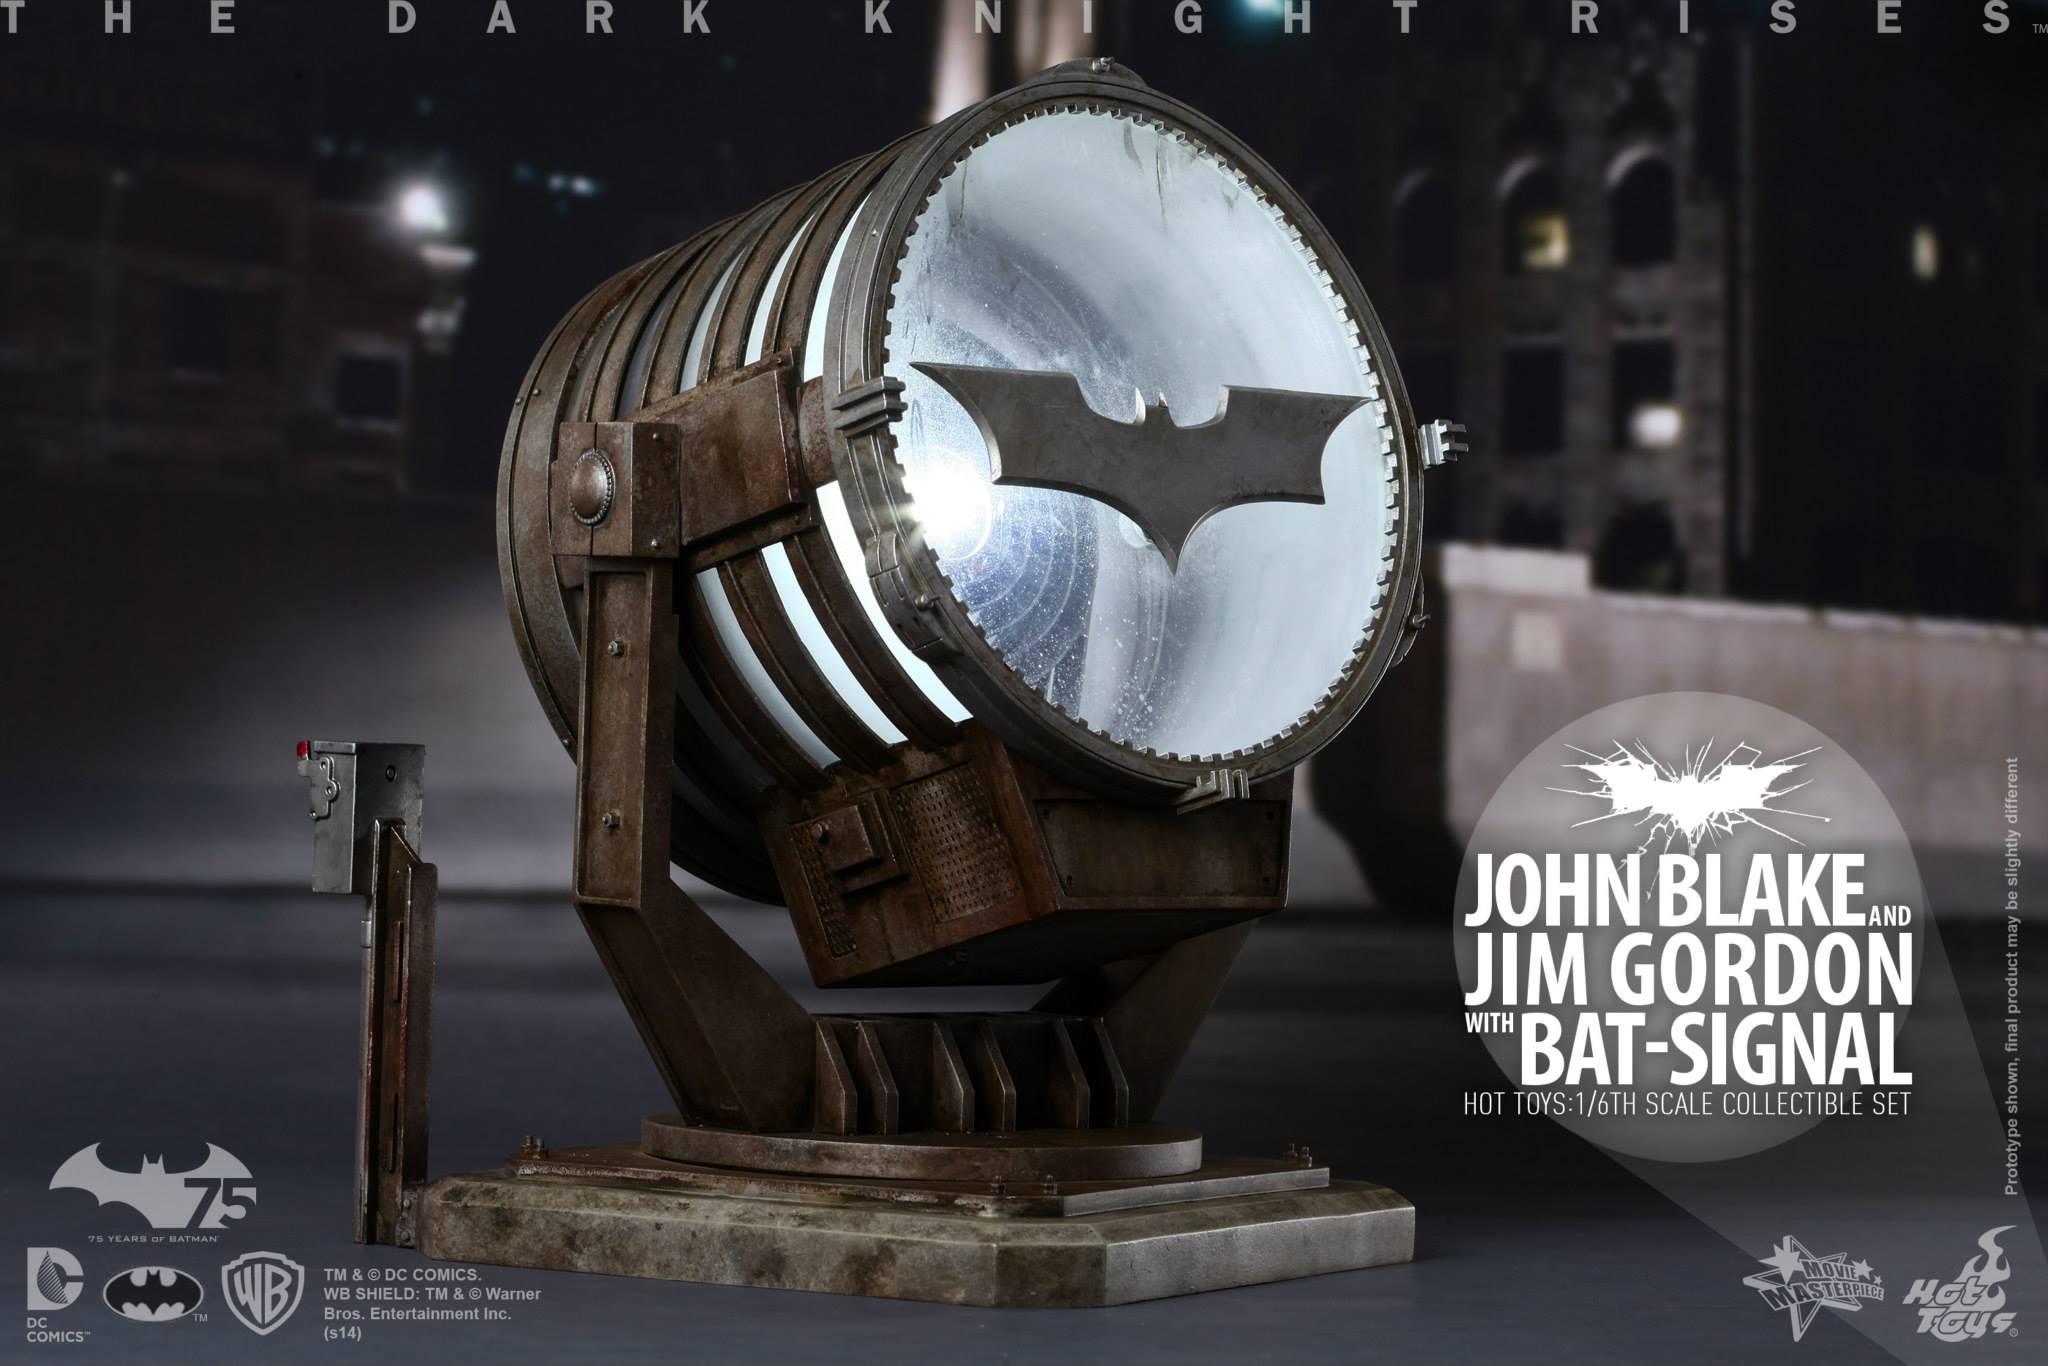 THE DARK KNIGHT RISES - Lt. JIM GORDON & JOHN BLAKE w/BATSIGNAL 307322102